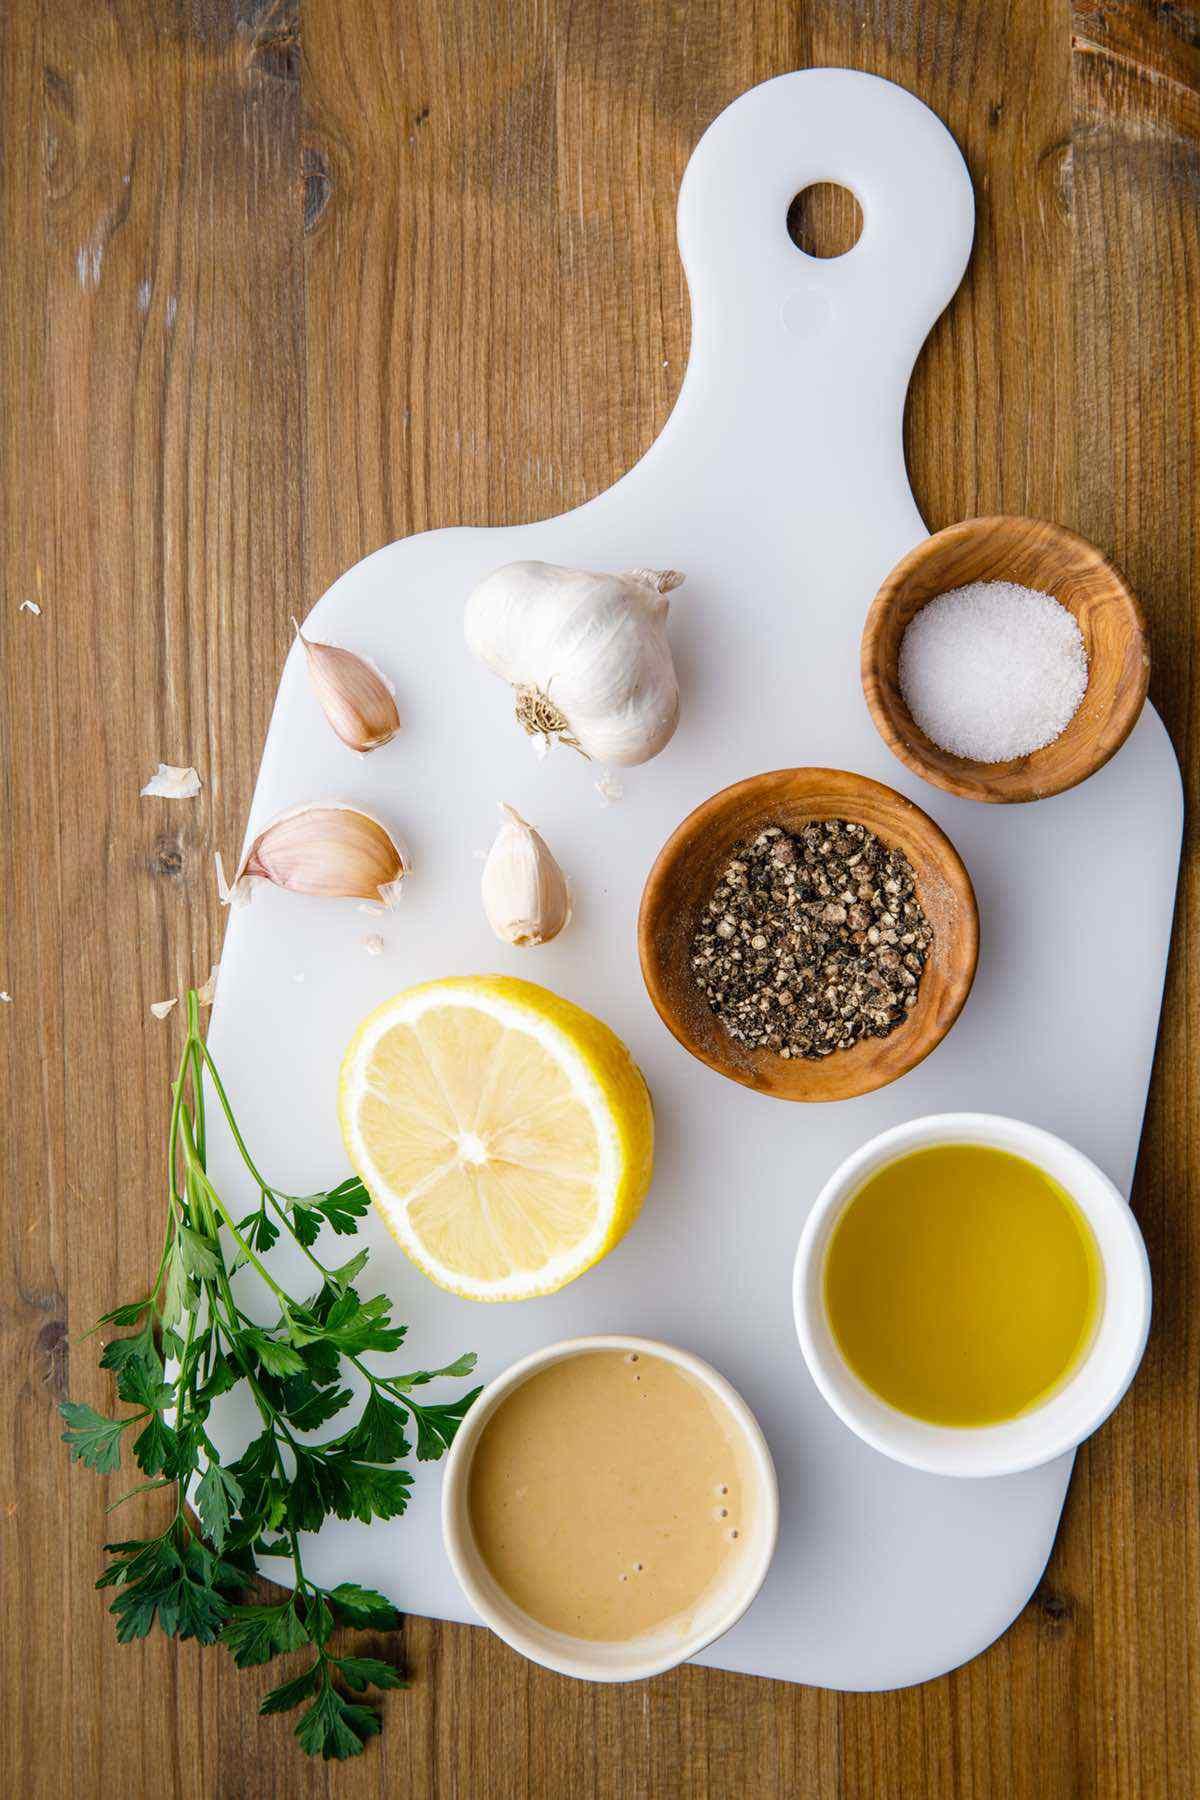 prepping ingredients for tahini dressing